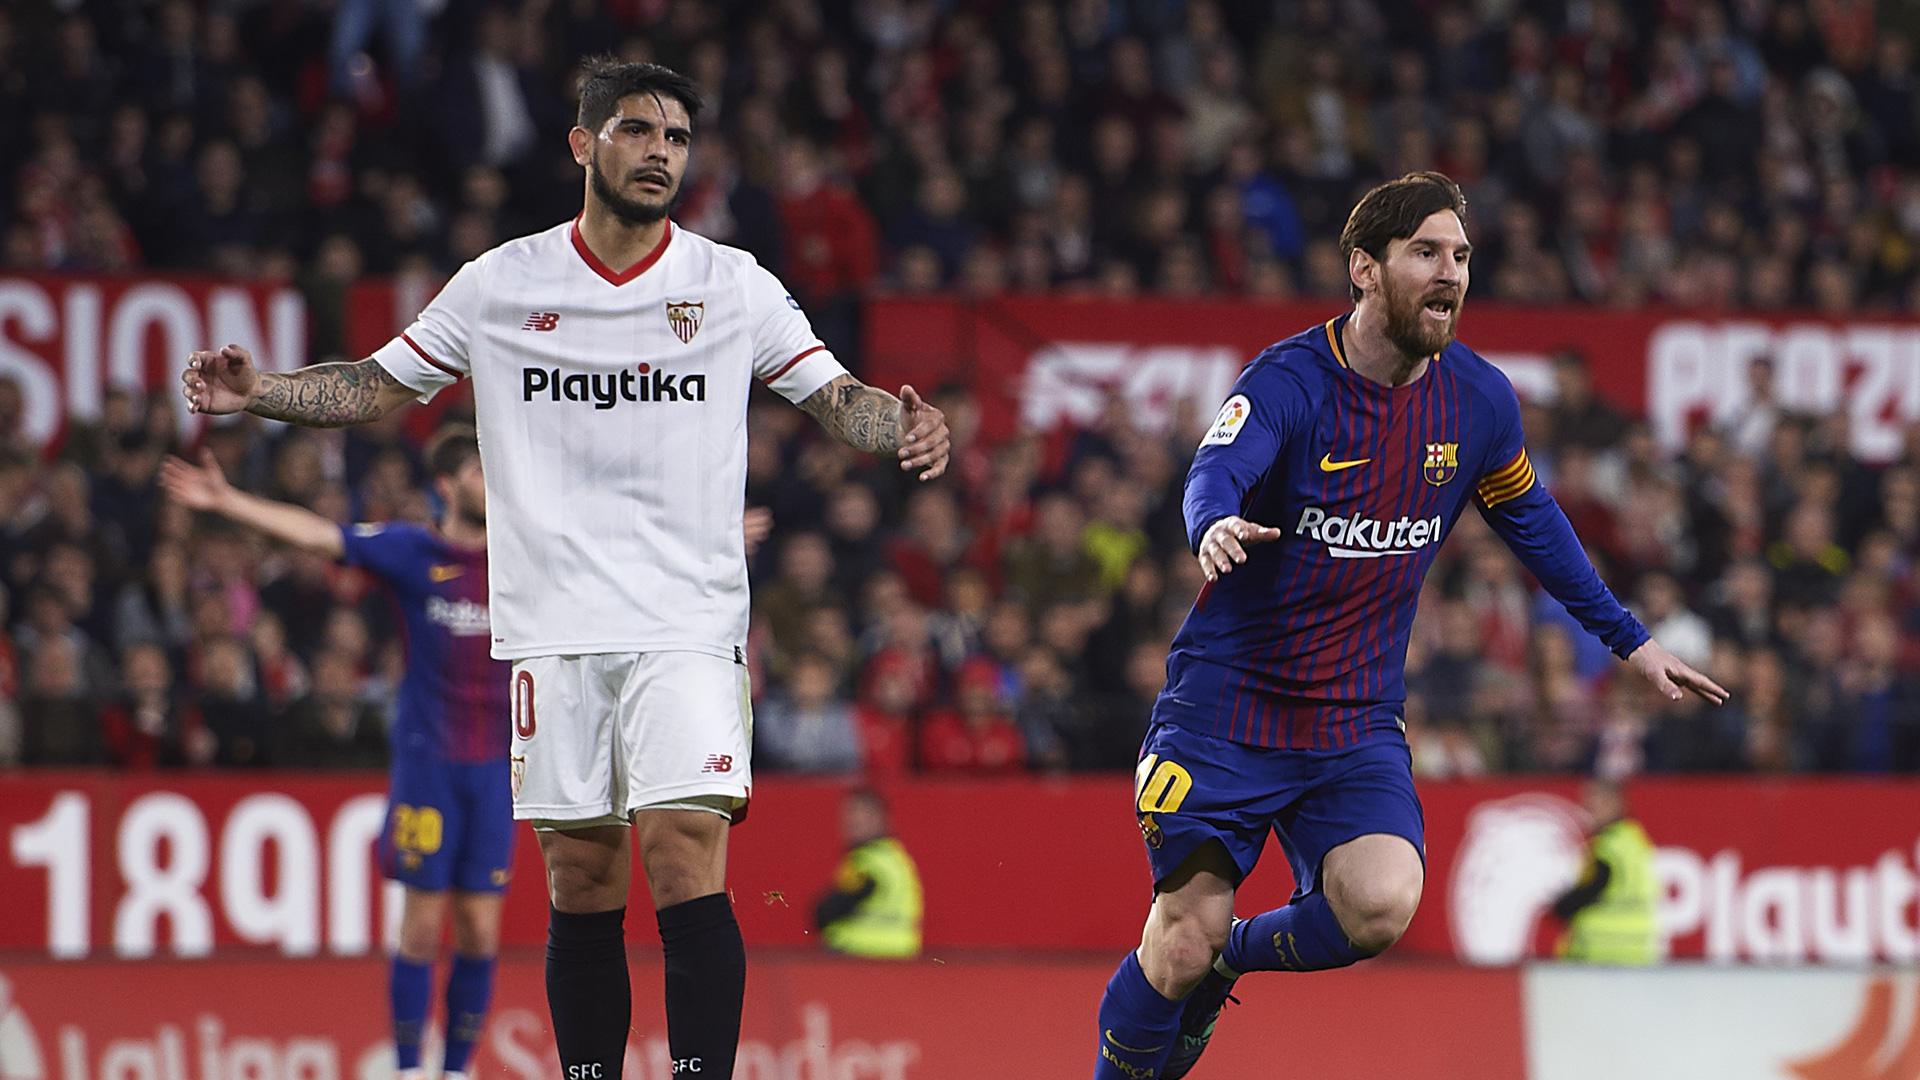 Copa del Rey, Finale: FC Barcelona mit Messi besiegt FC Sevilla klar